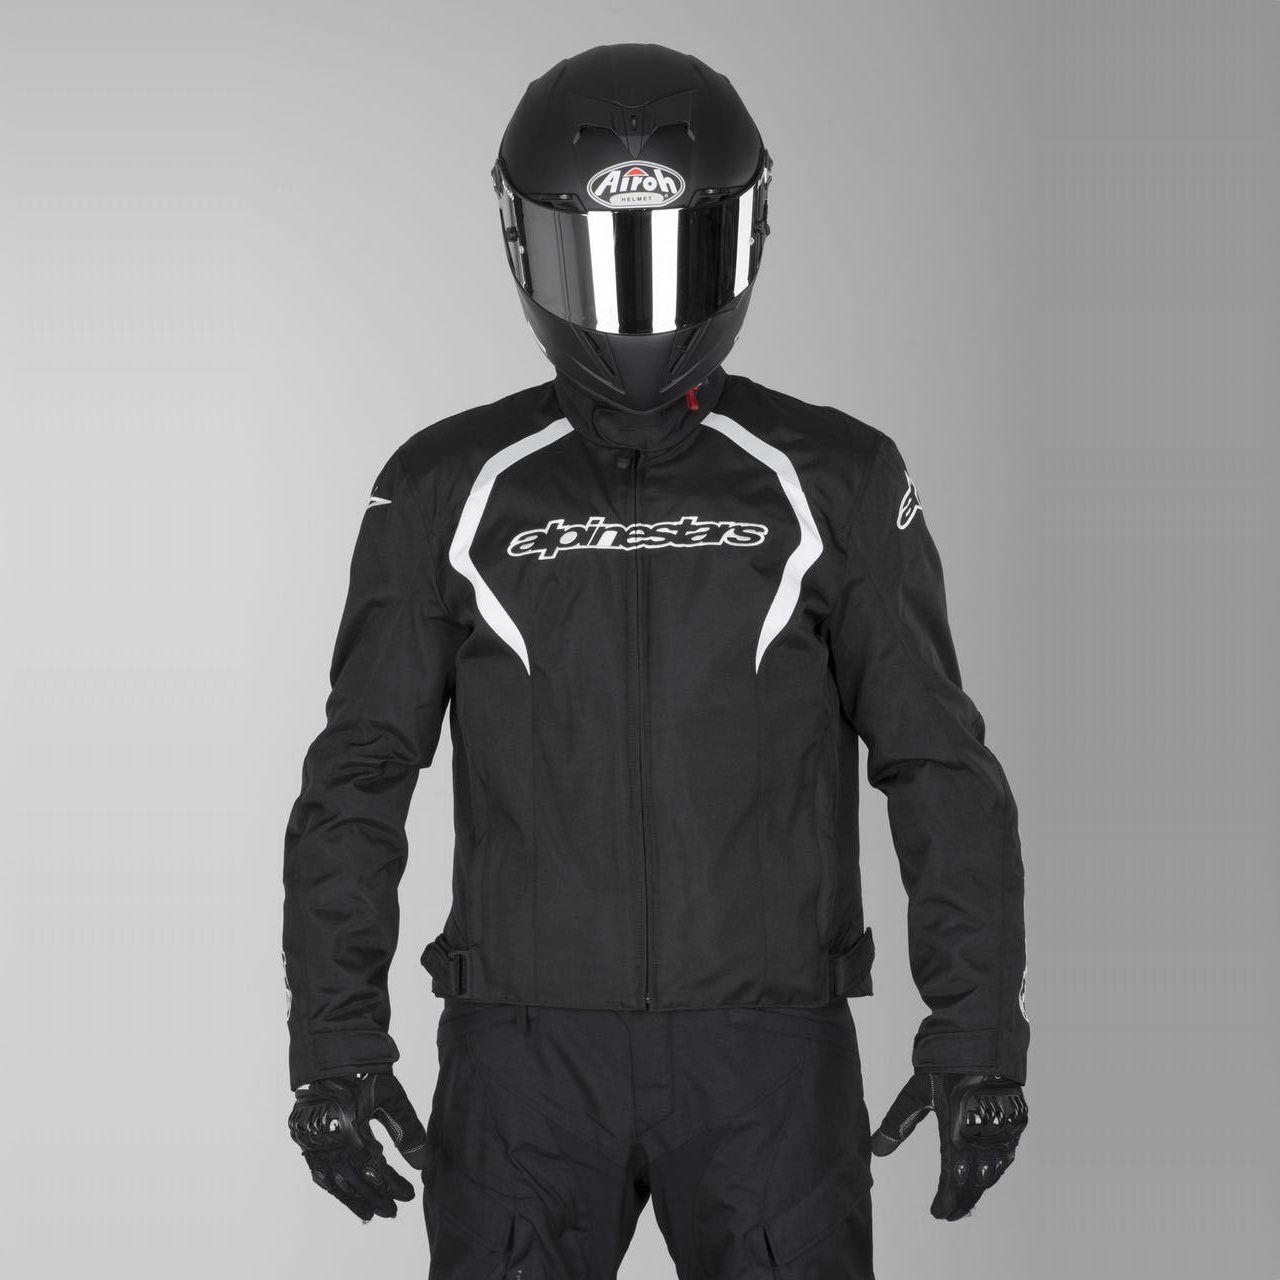 Jaqueta Alpinestars Fastback - Preto/Branco - Impermeável  - Super Bike - Loja Oficial Alpinestars